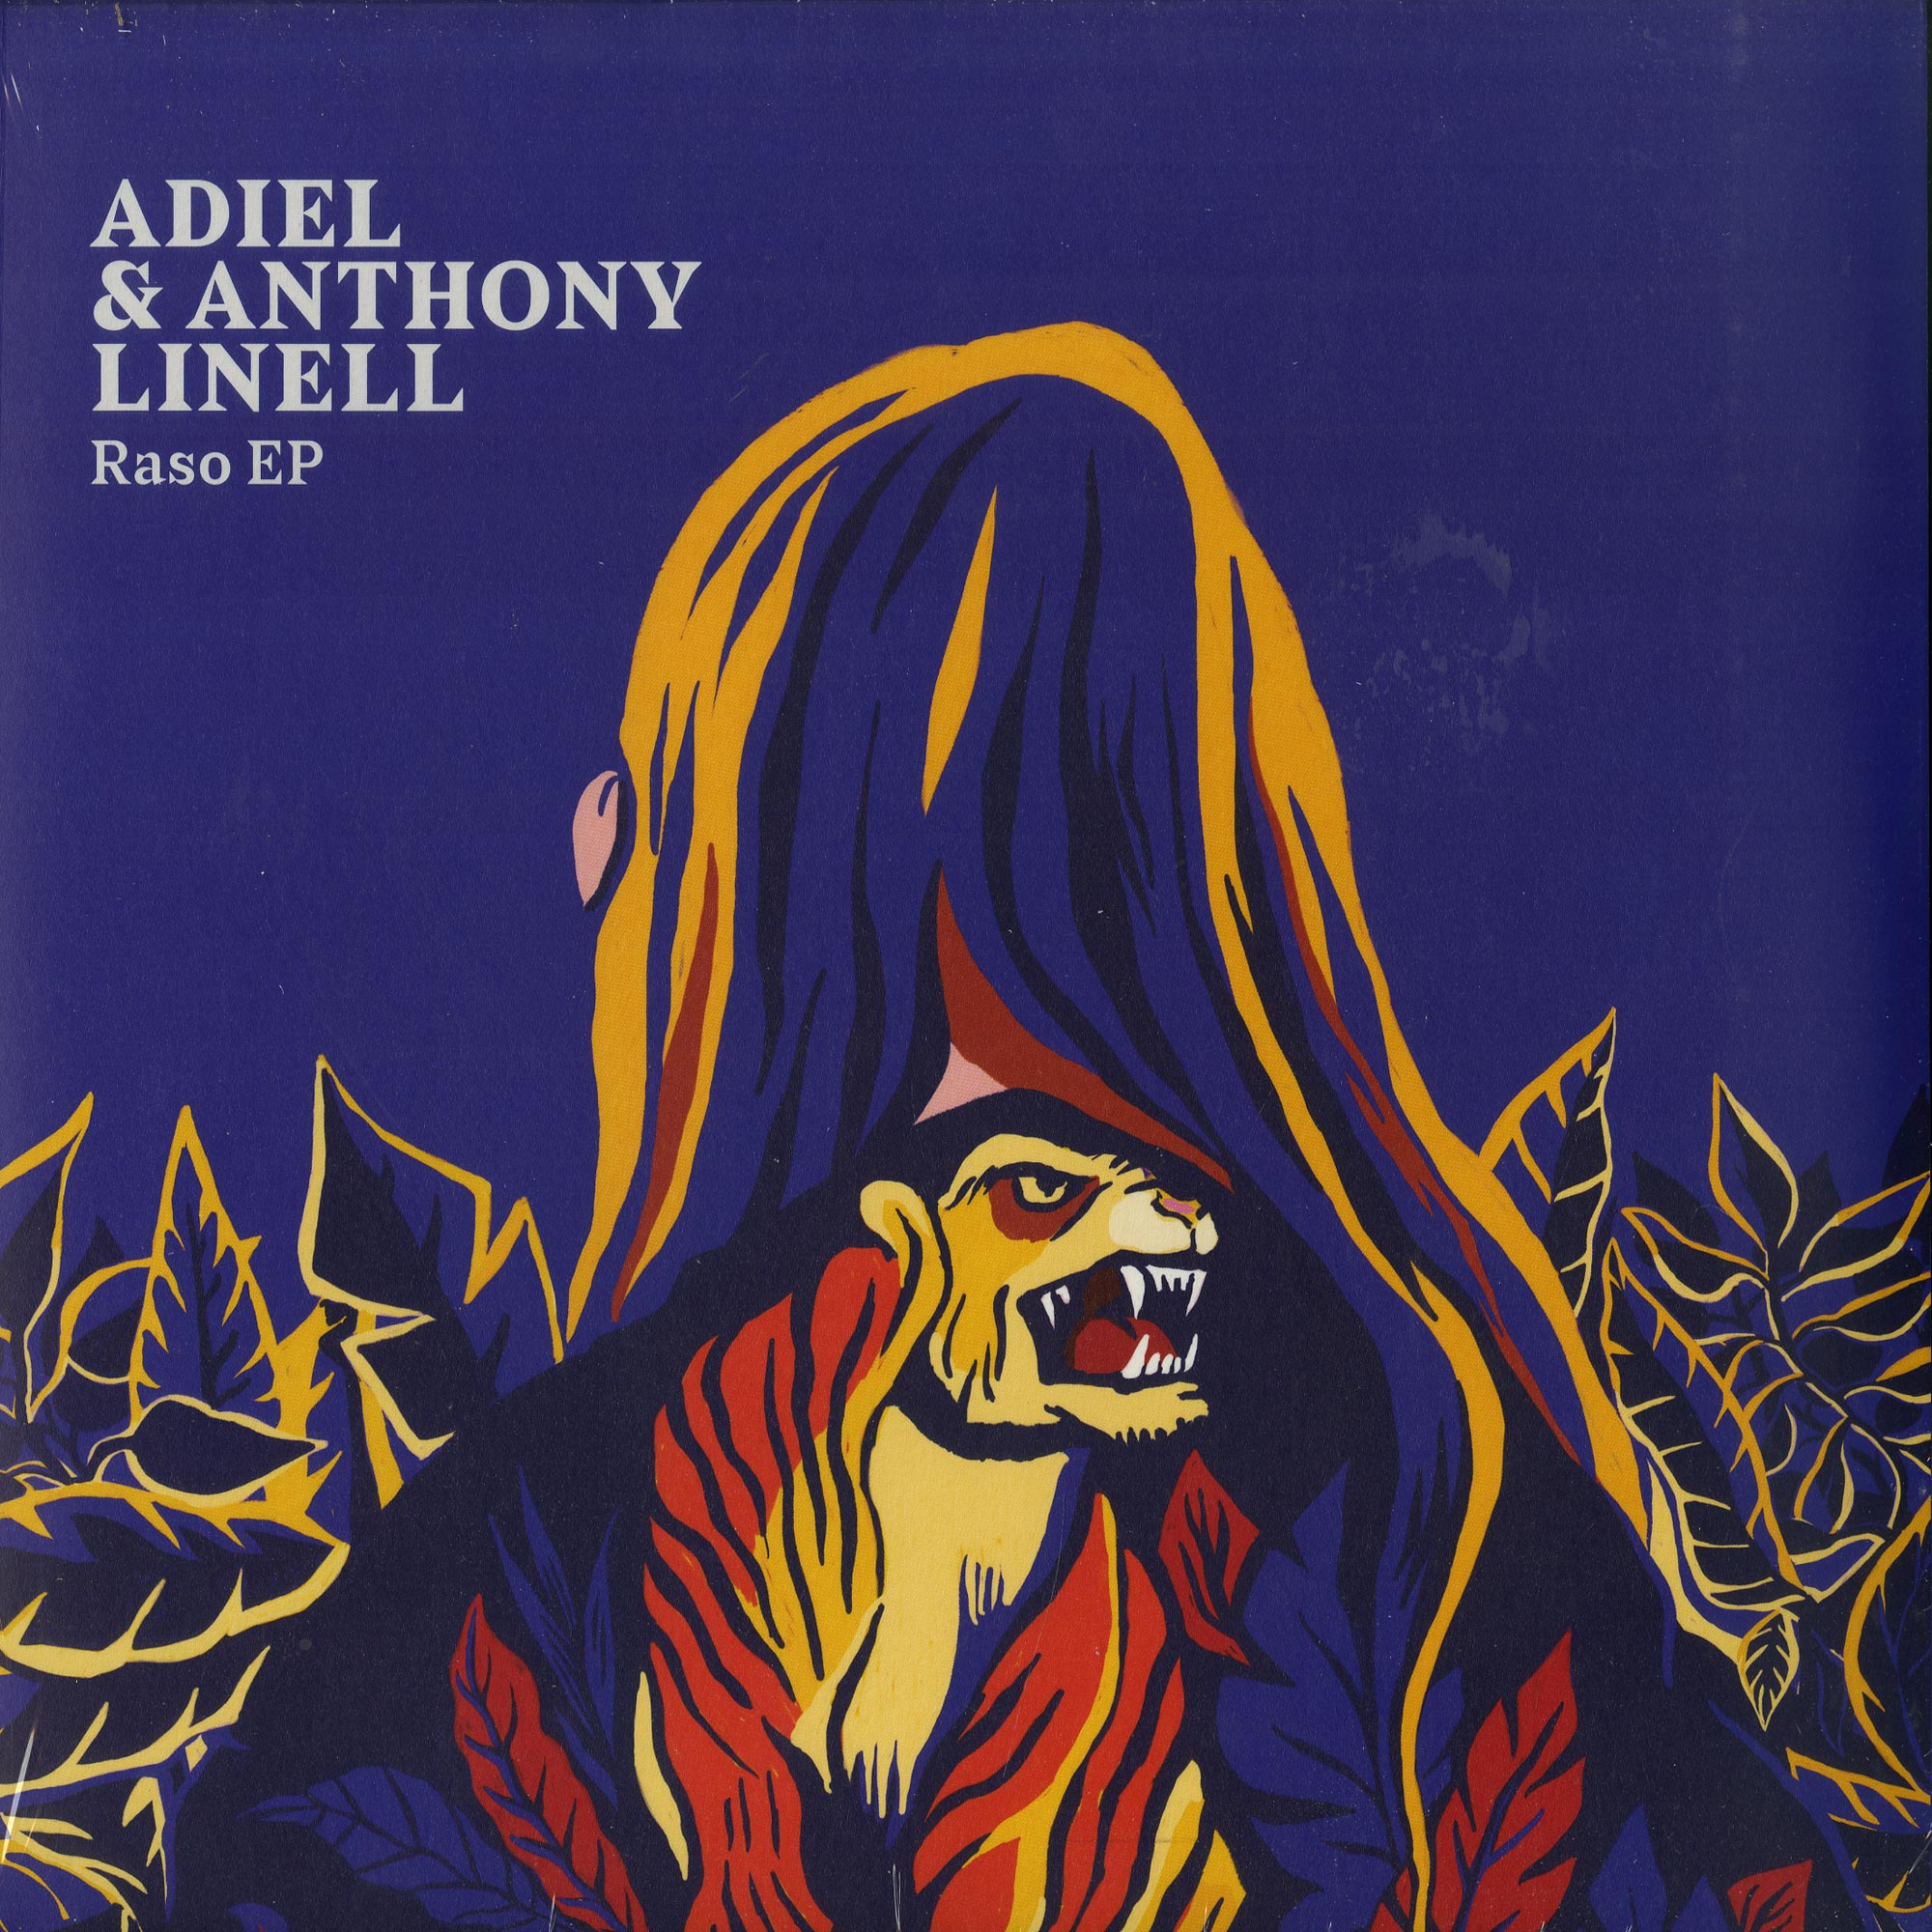 Adiel & Anthony Linell - RASO